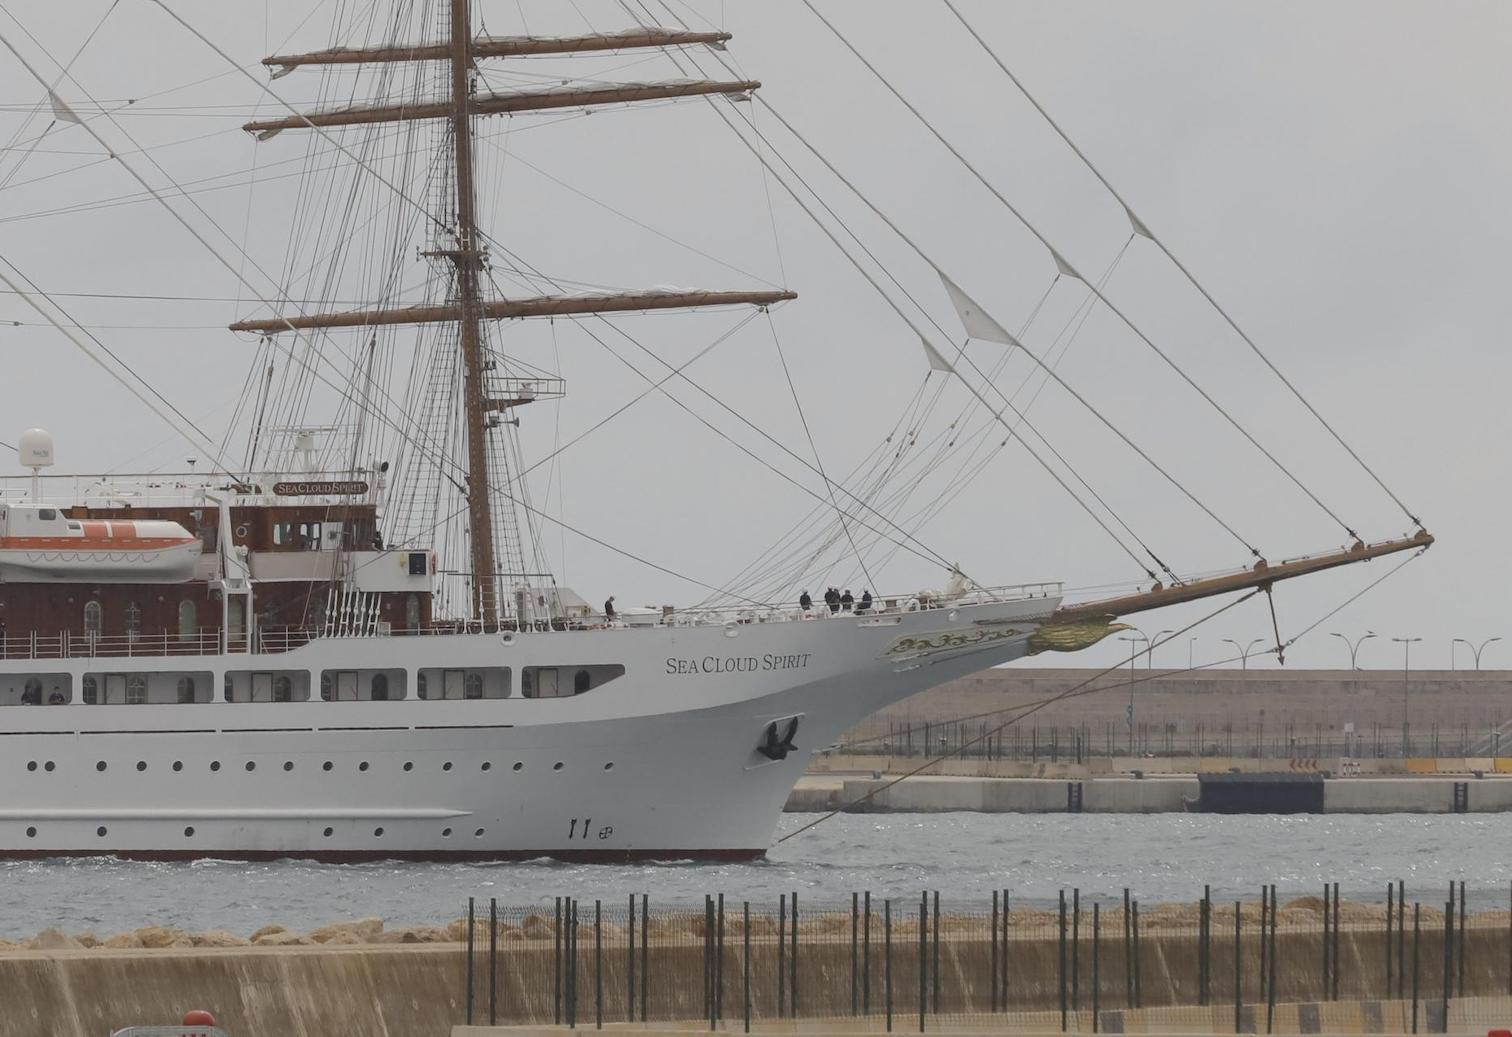 'Sea Cloud Spirit' arriving in Palma.